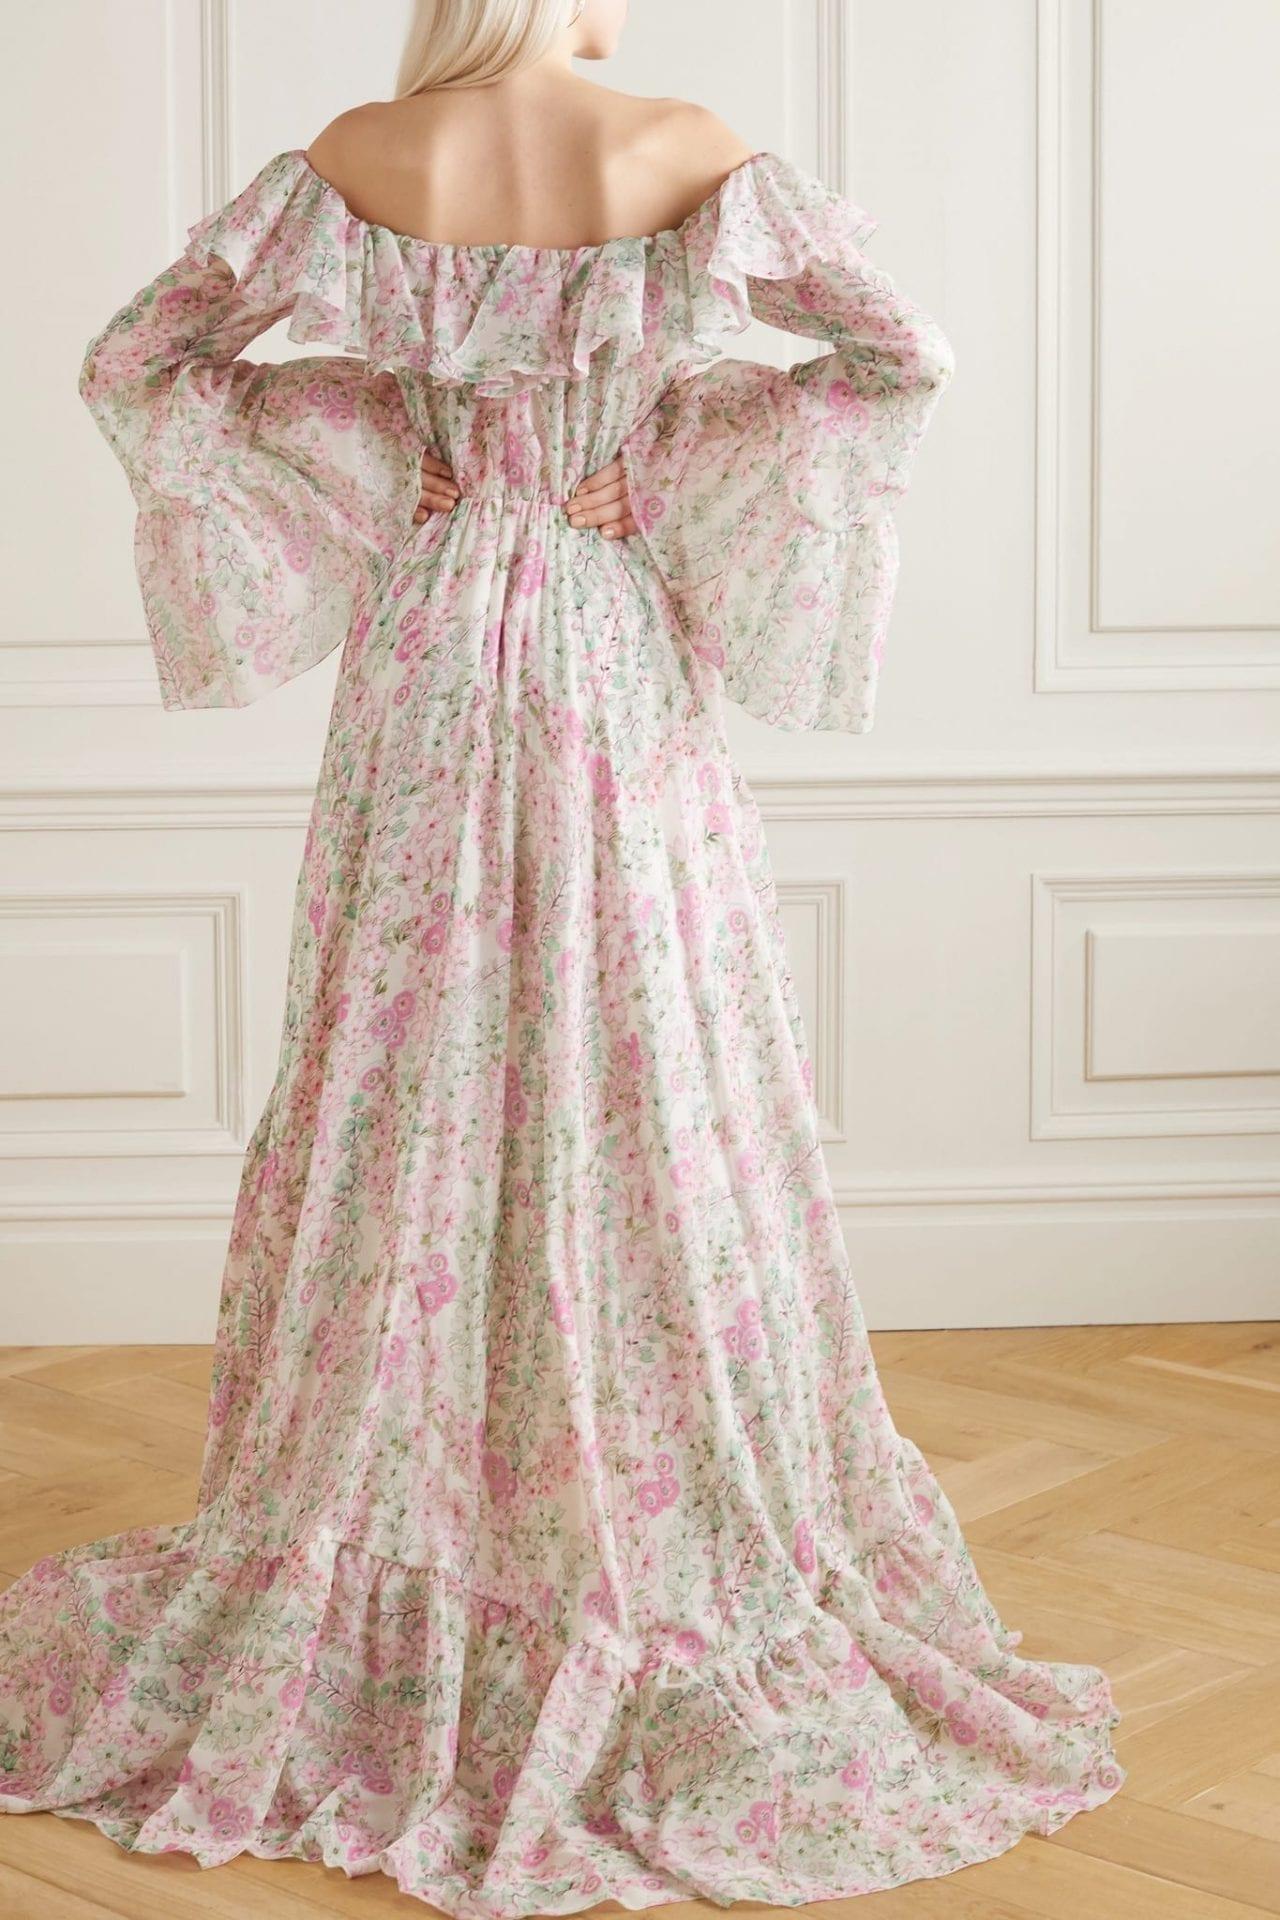 GIAMBATTISTA VALLI Asymmetric Bow-embellished Ruffled Floral-print Silk-chiffon Dress